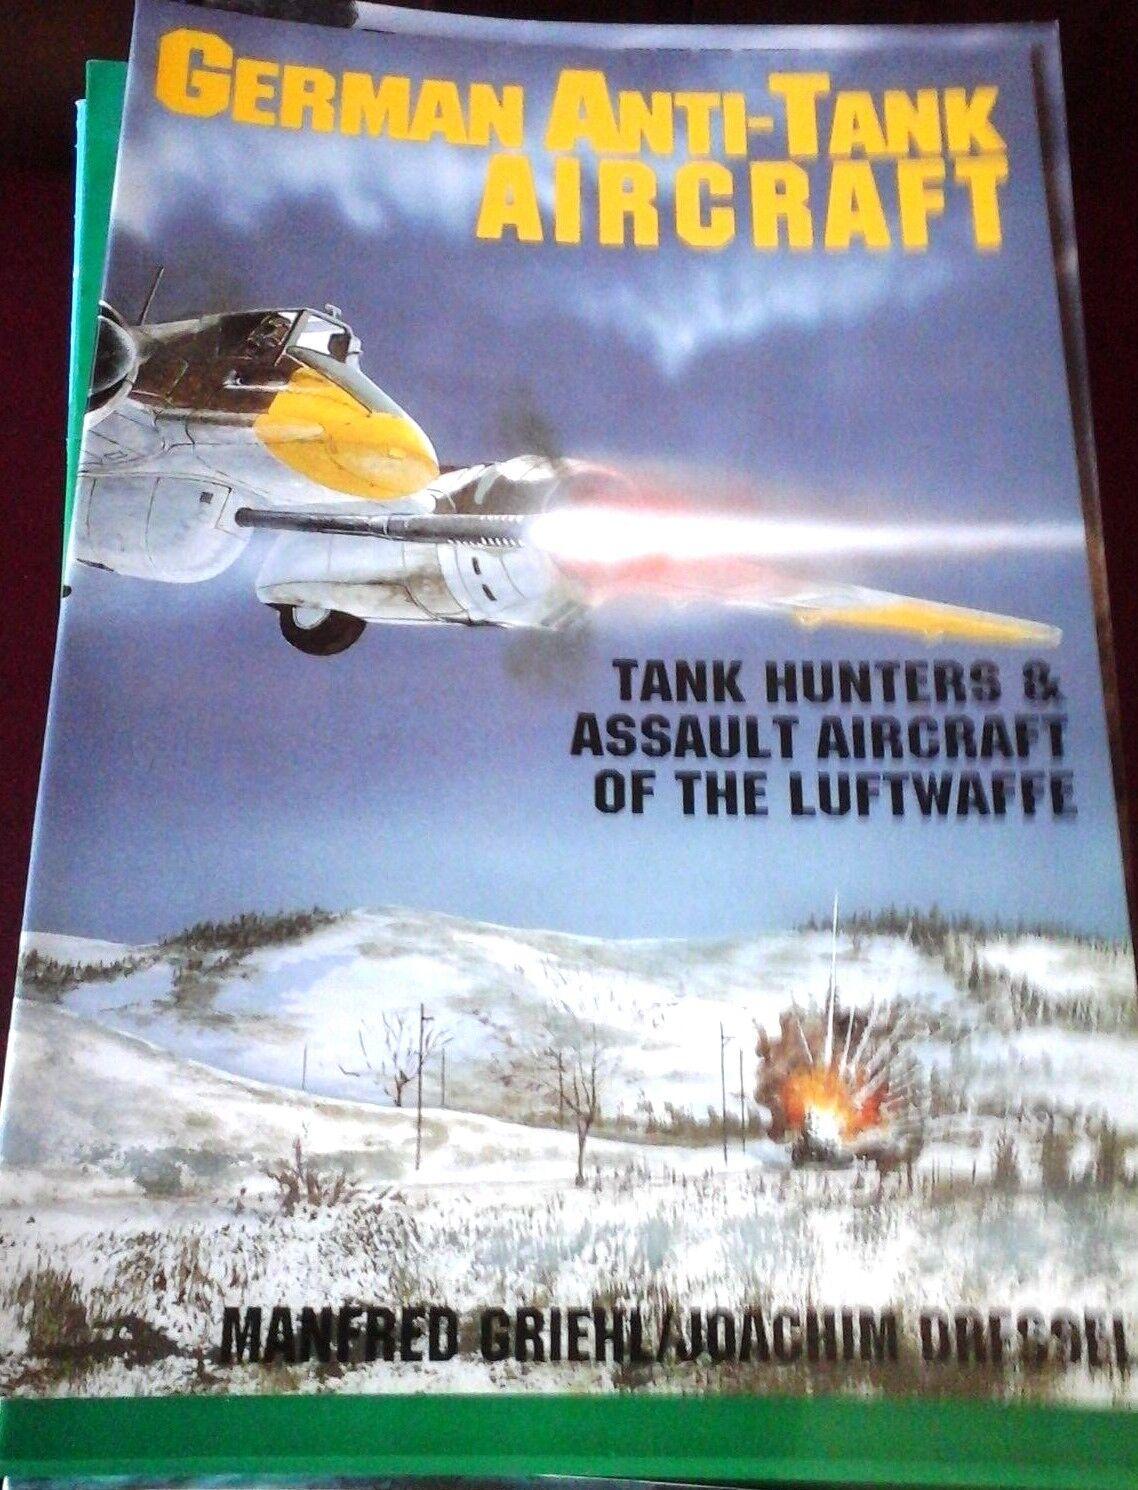 GERMAN ANTI-TANK AIRCRAFT-TANK HUNTERS & ASSAULT AIRCRAFT OF THE LUFTWAFFE -BY G